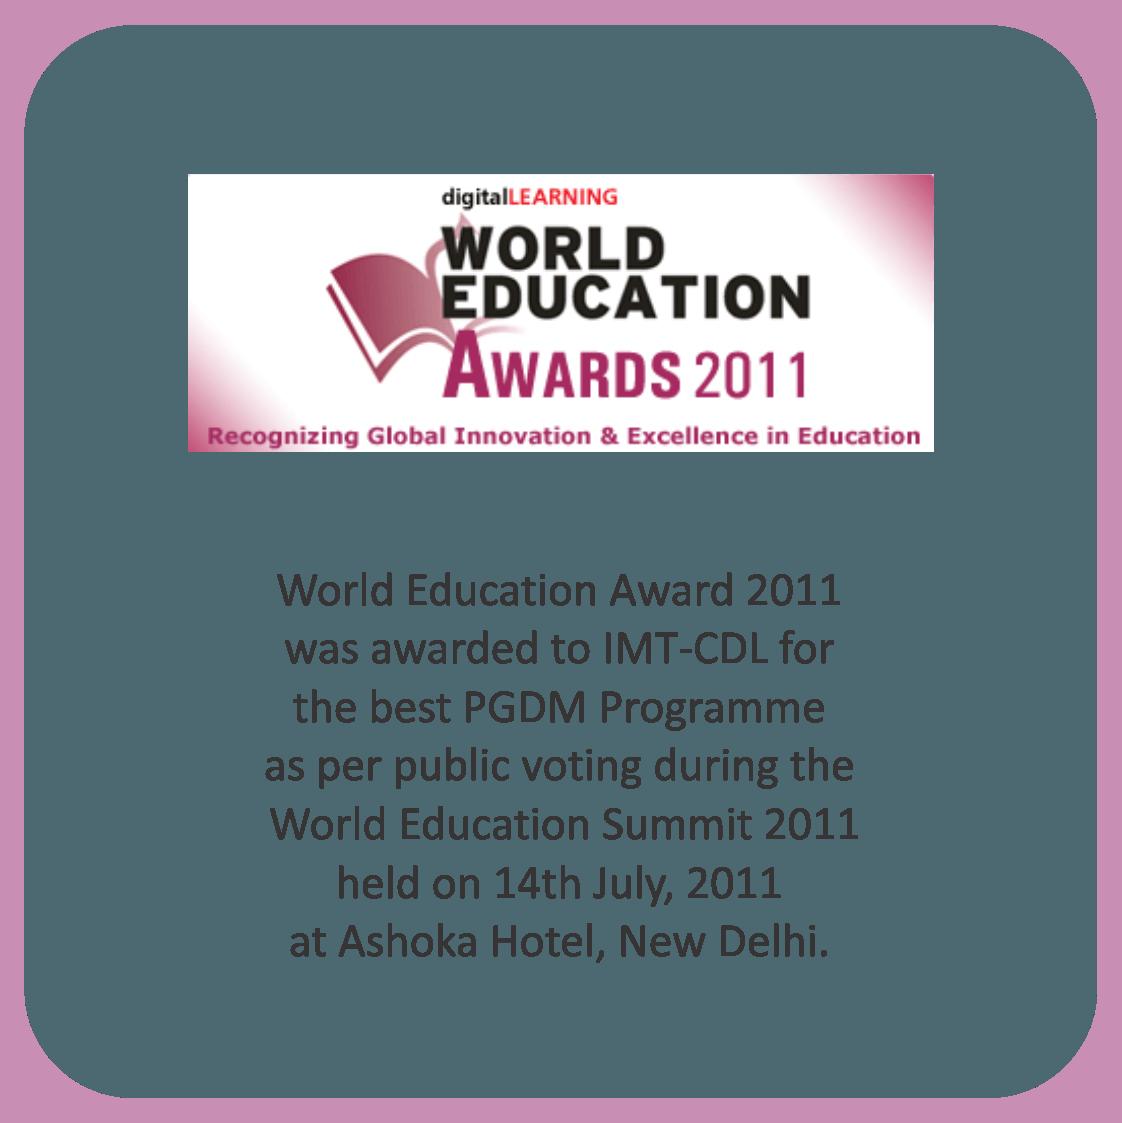 world education award